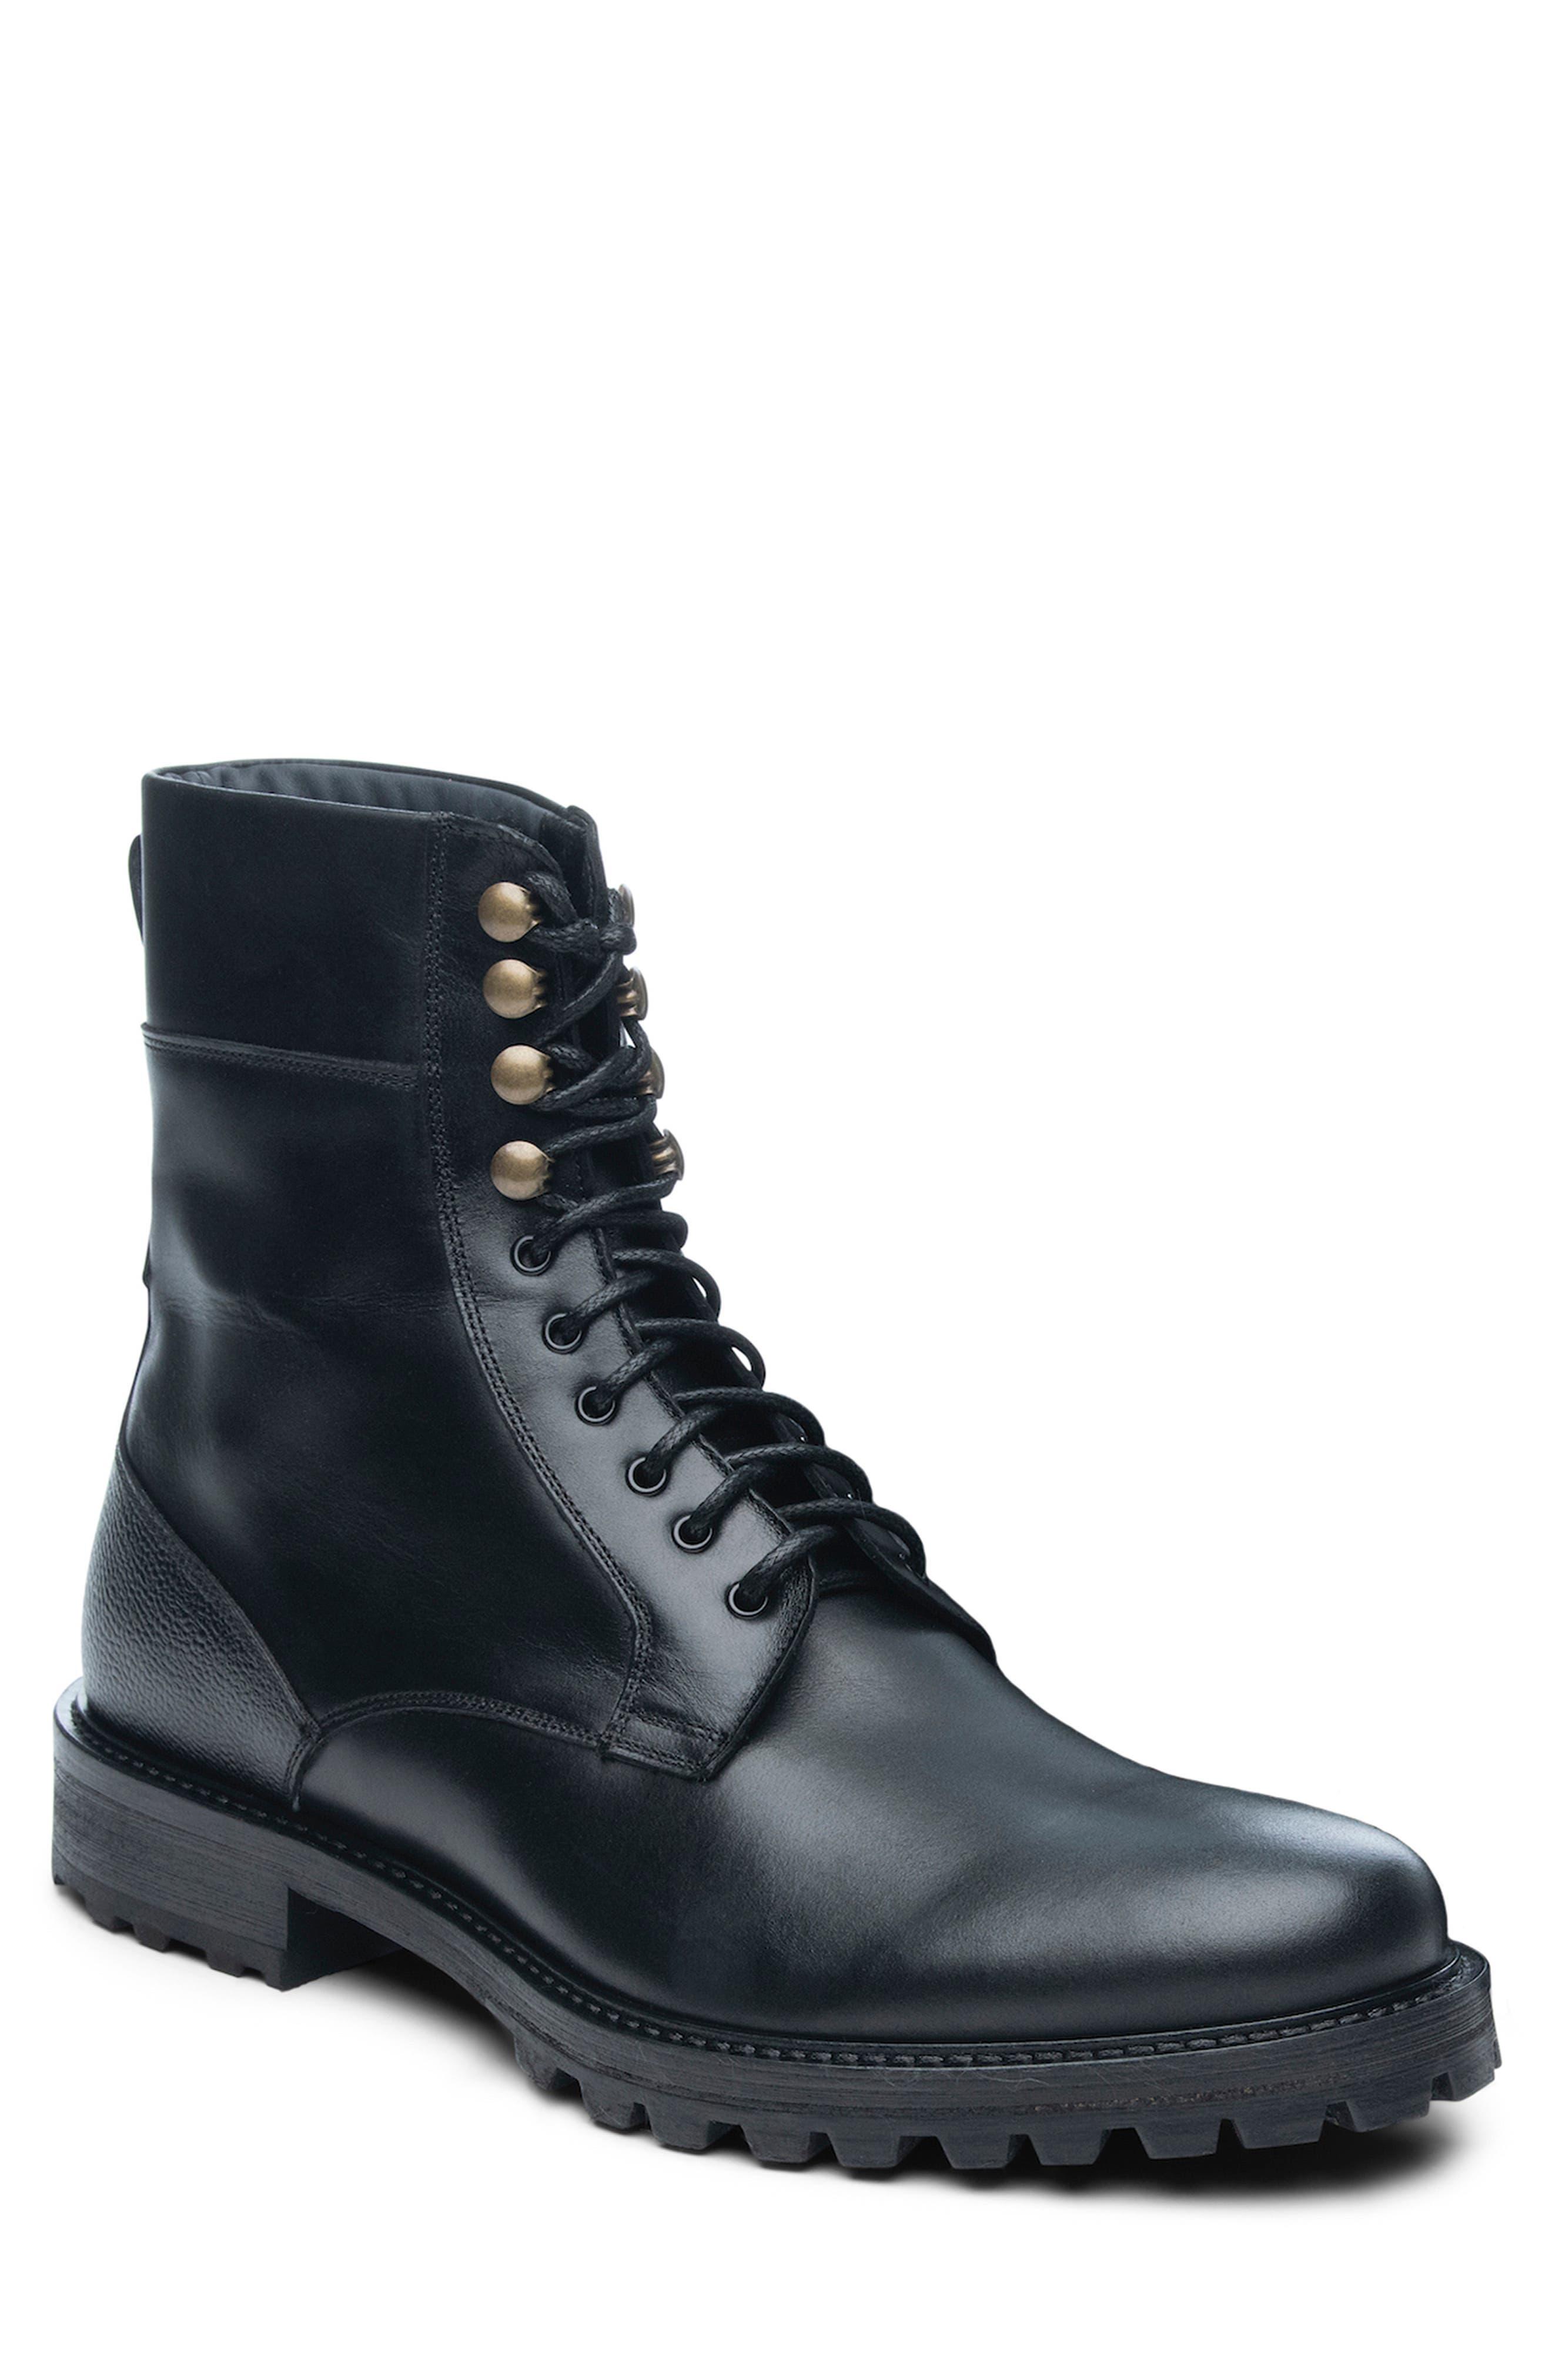 ANKARI-FLORUSS Plain Toe Combat Boot